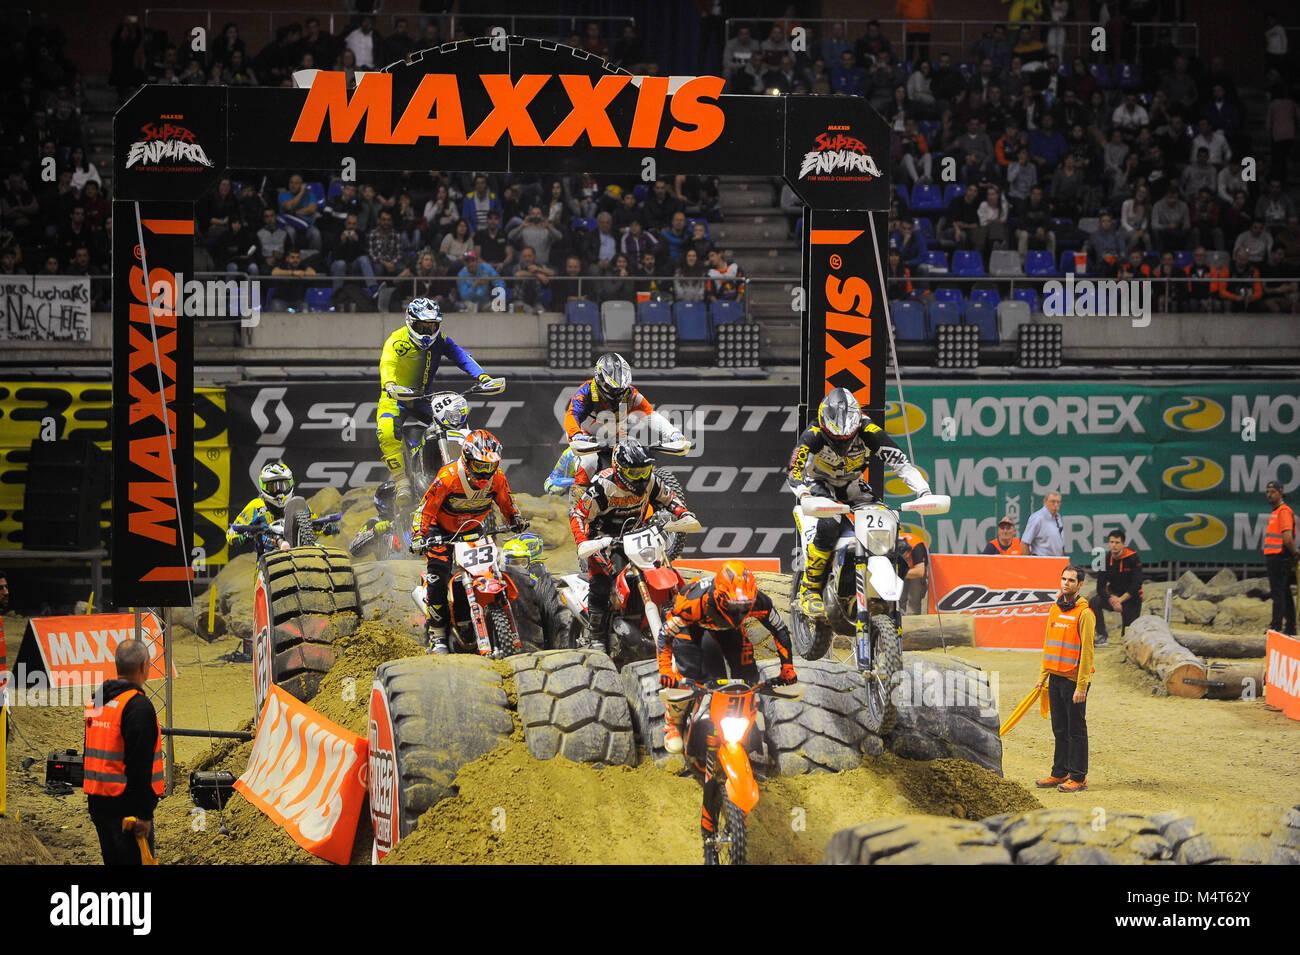 Malaga, Spain. 17th Feb, 2018. Riders competing during the GP Spanish Maxxis Fim Super Enduro World Championship - Stock Image